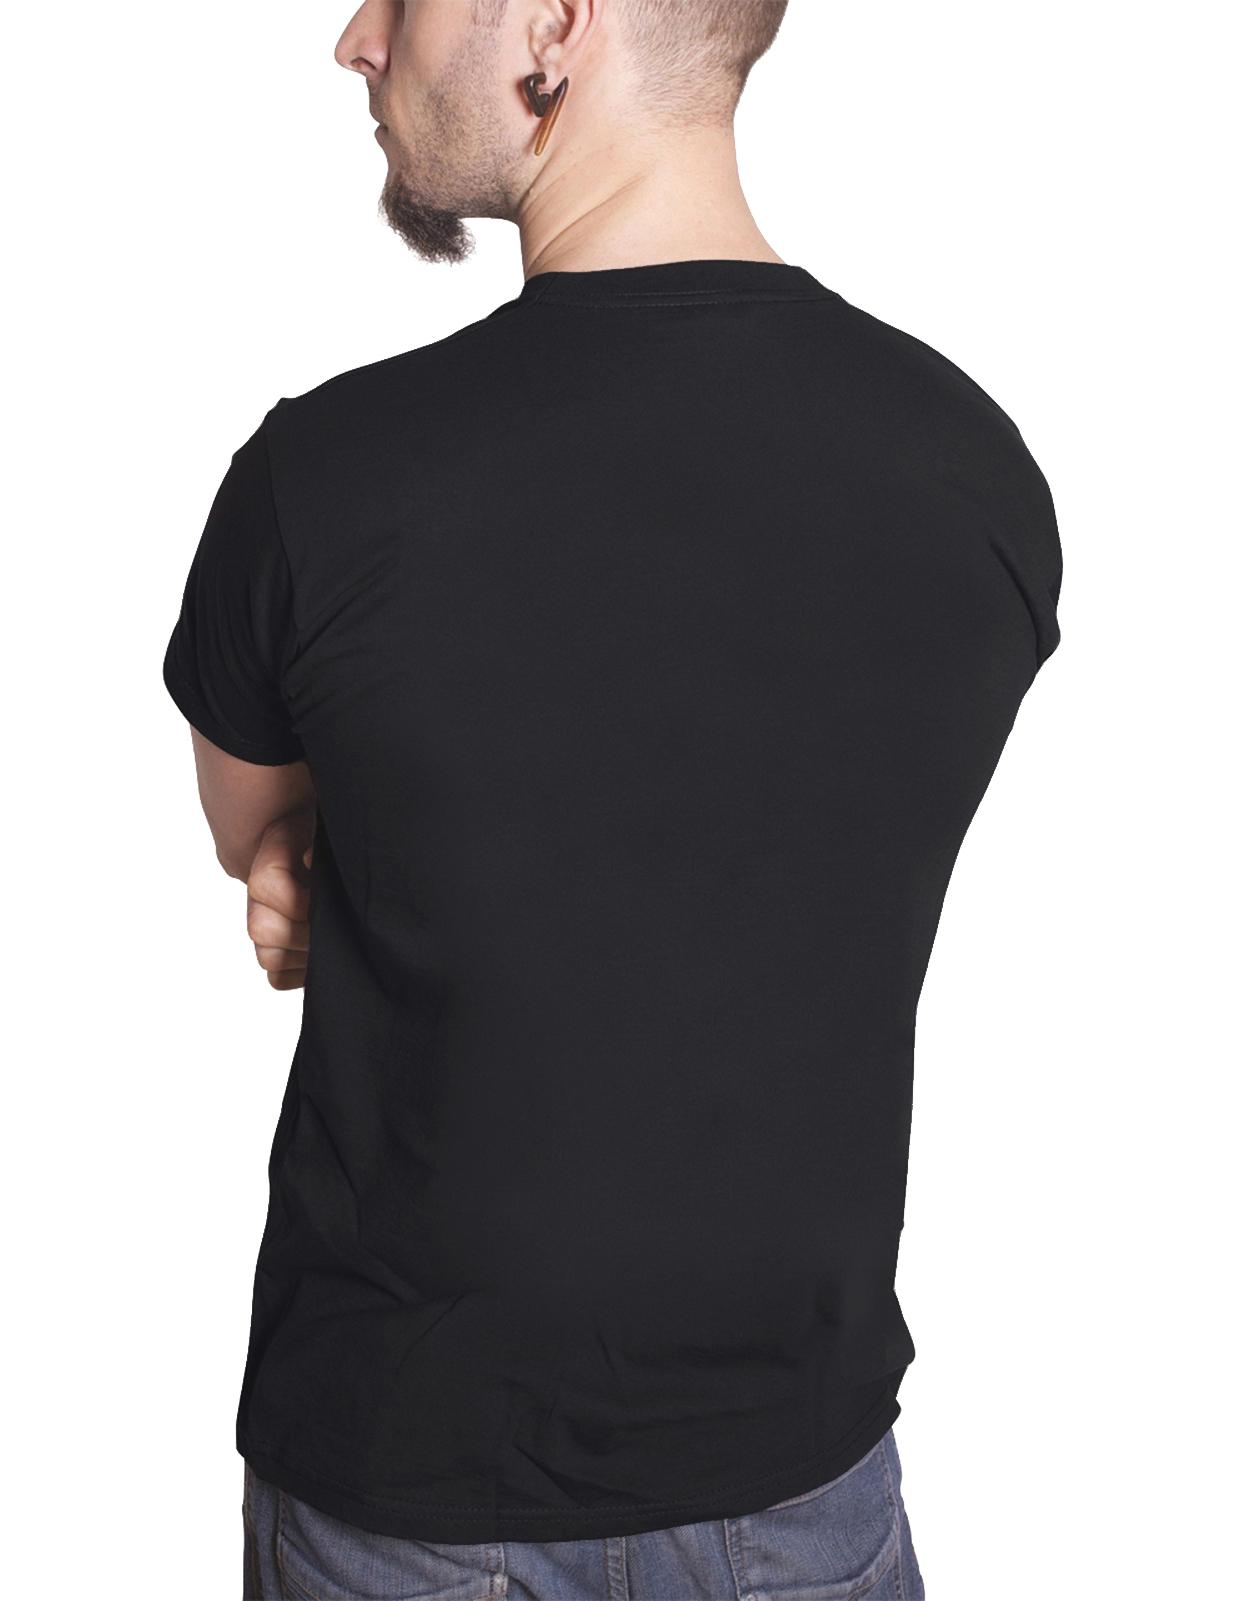 Motorhead-T-Shirt-Lemmy-RIP-England-warpig-clean-your-clock-official-new-mens Indexbild 51